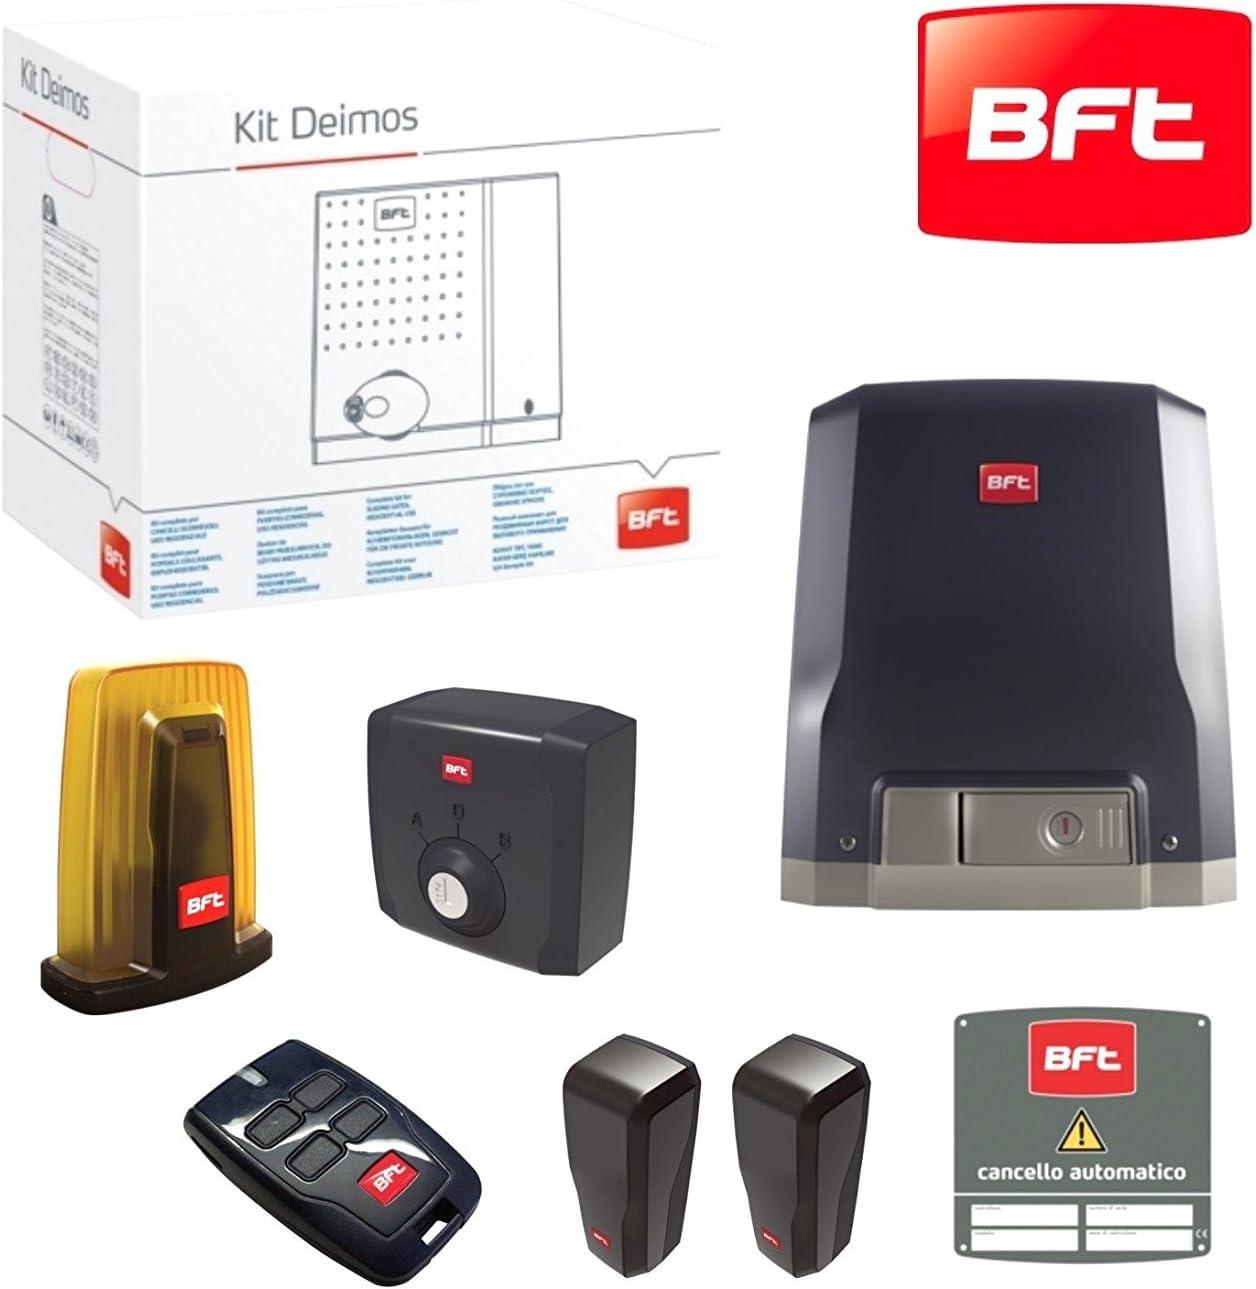 BFT Kit de puerta corredera automática Deimos Motor A600 24V 600 ...